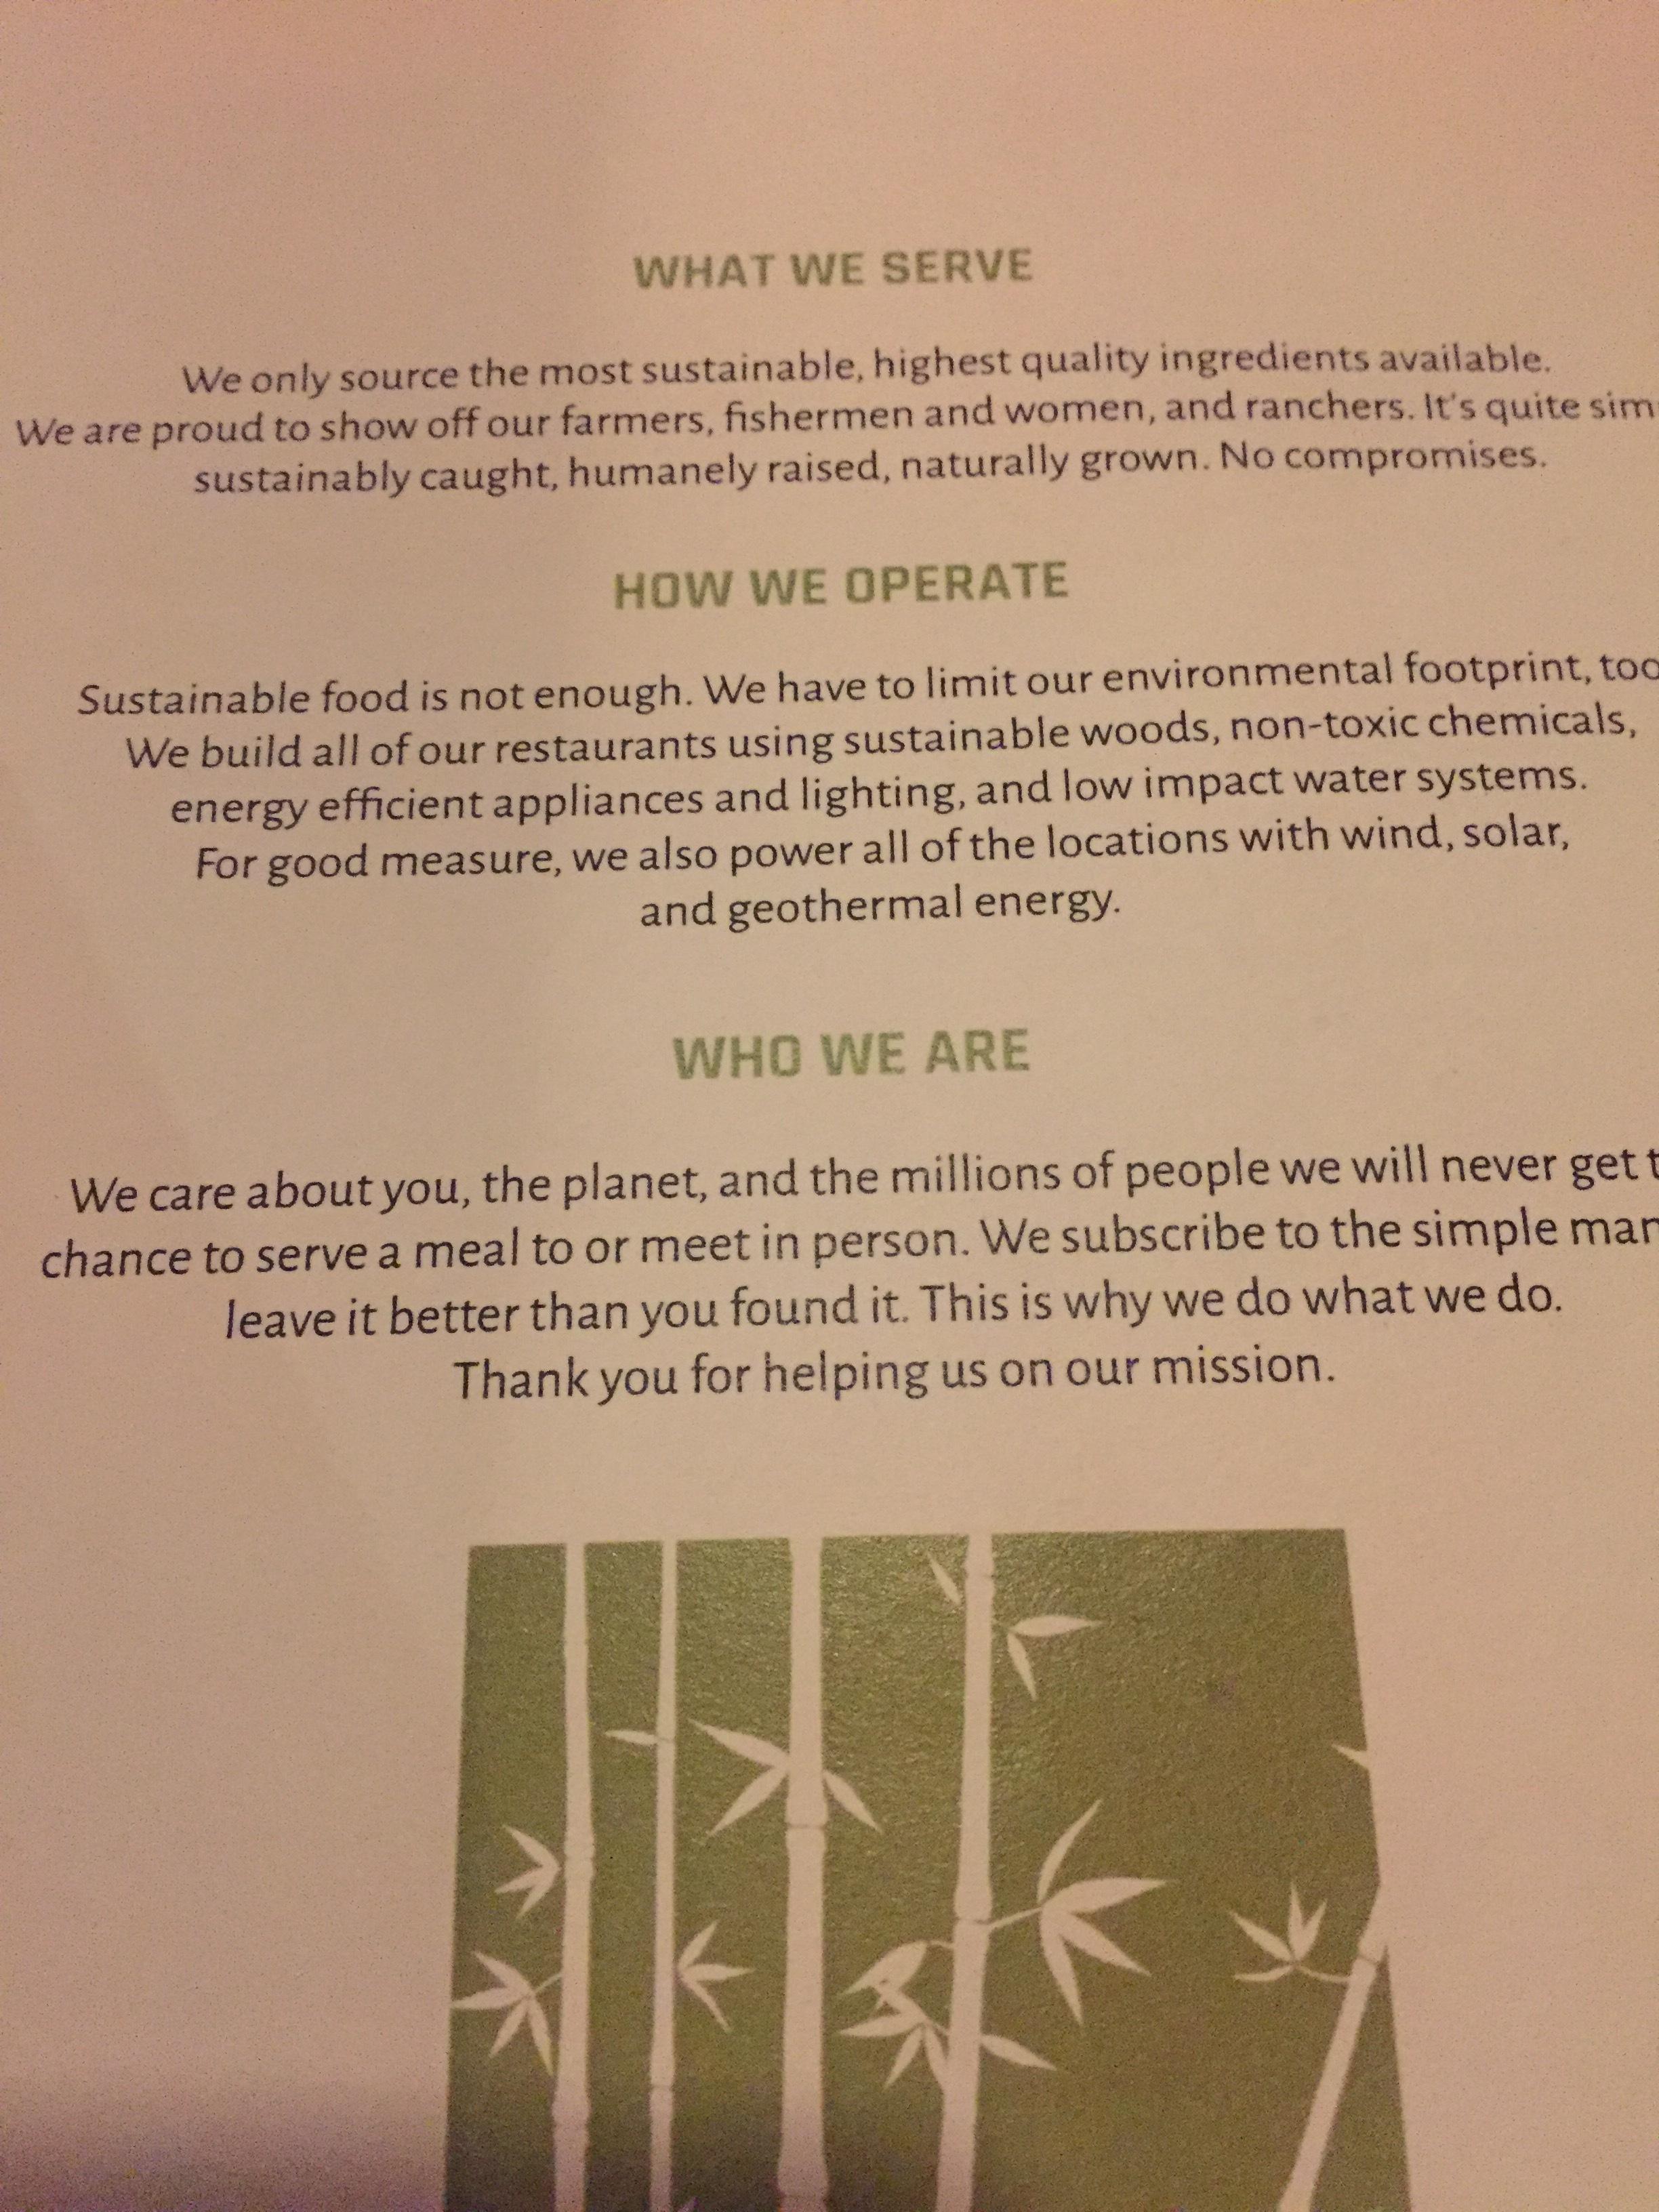 Bamboo Sushi Mission Statement.